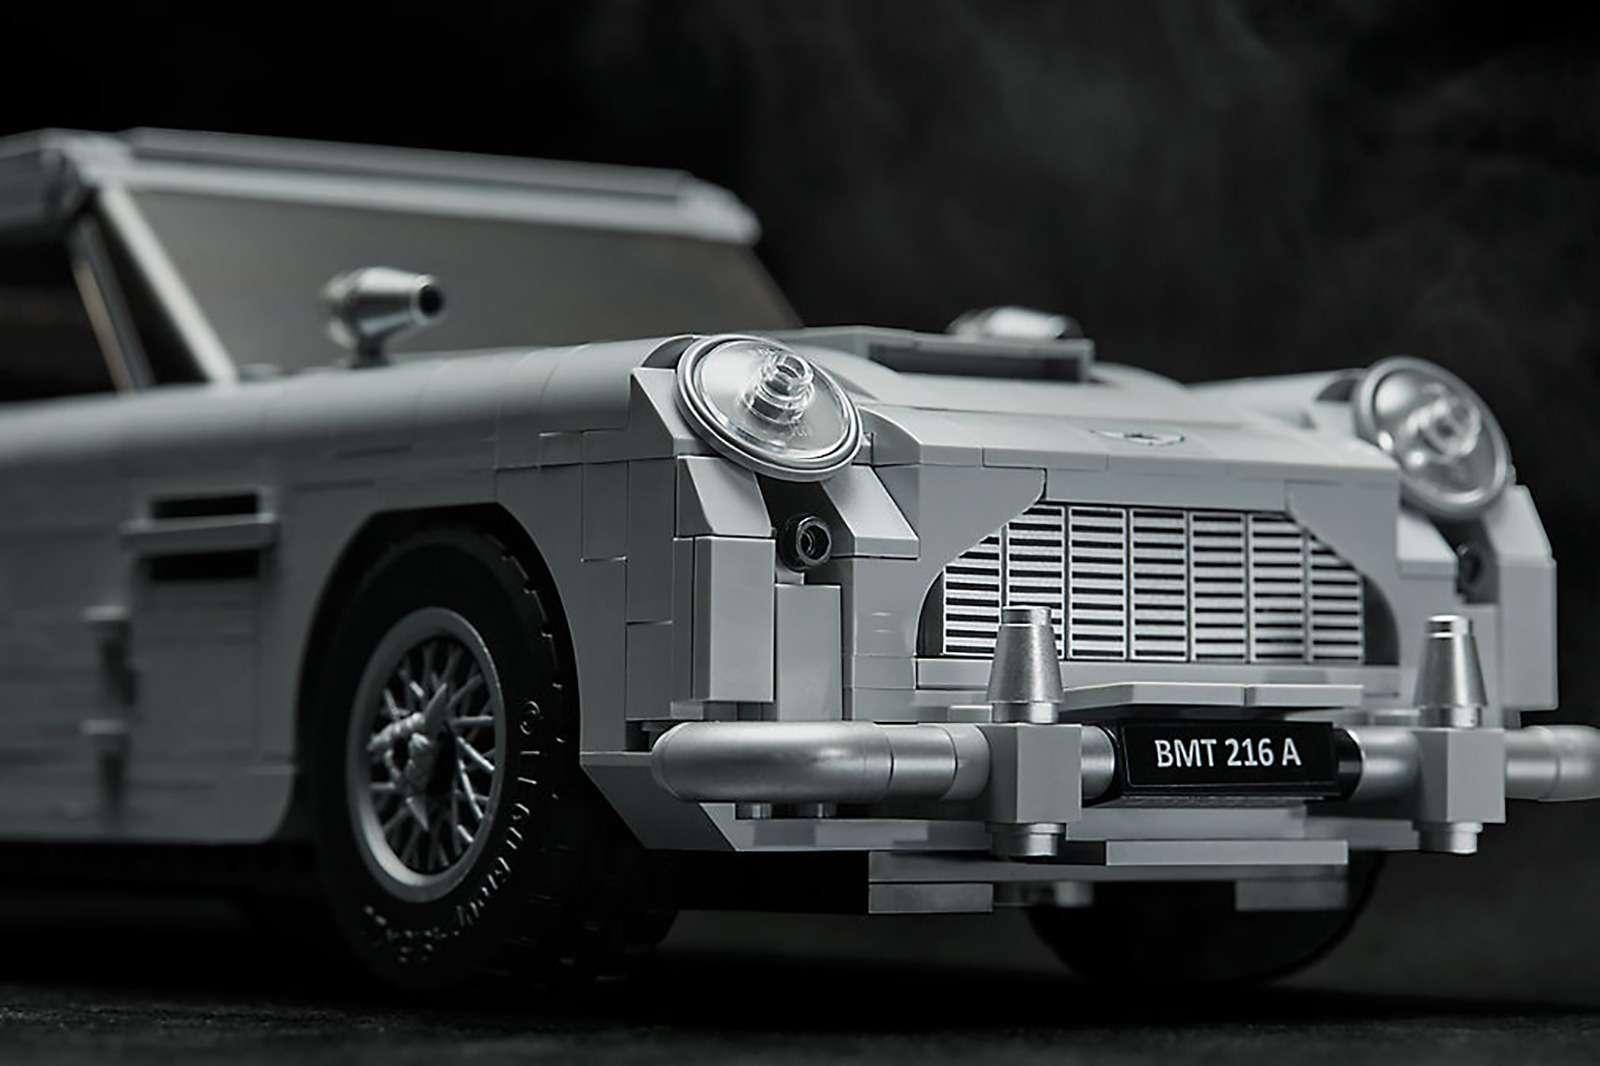 Хочешь машину как у Джеймса Бонда? Собери ее сам! — фото 888209